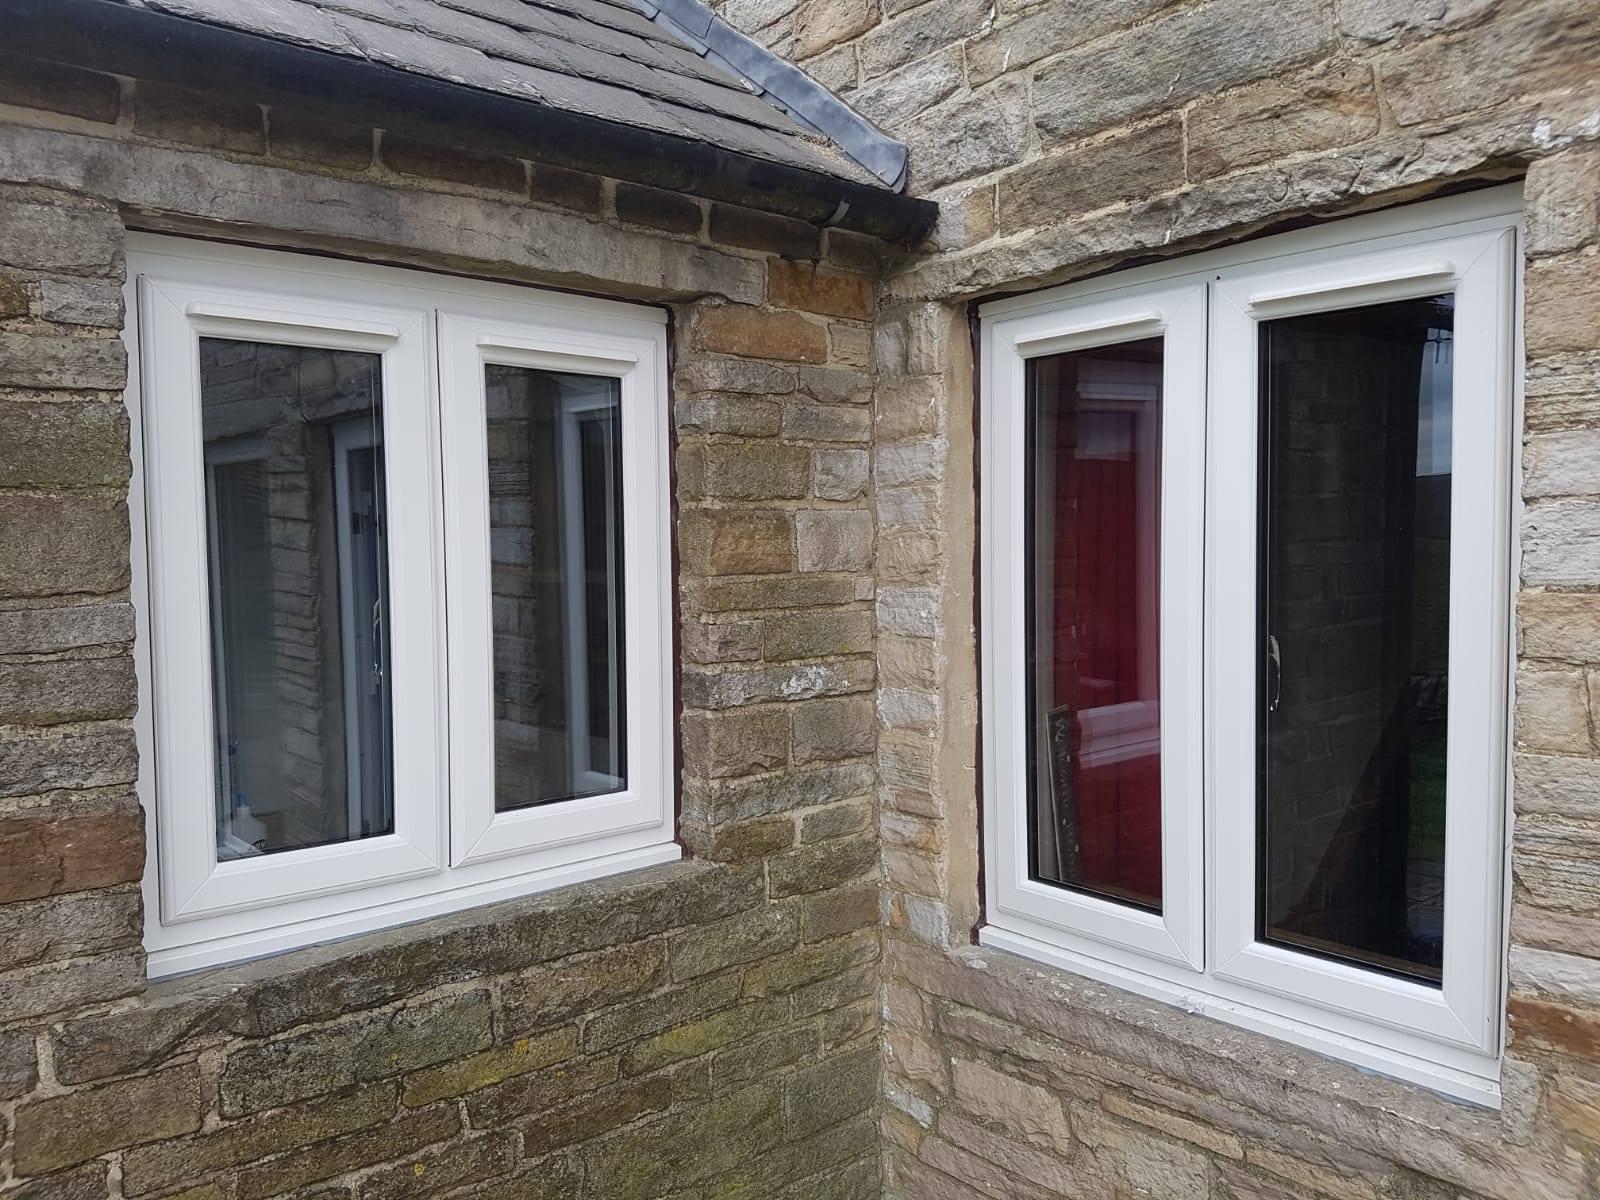 2 WHITE UPVC WINDOWS INSTALLED